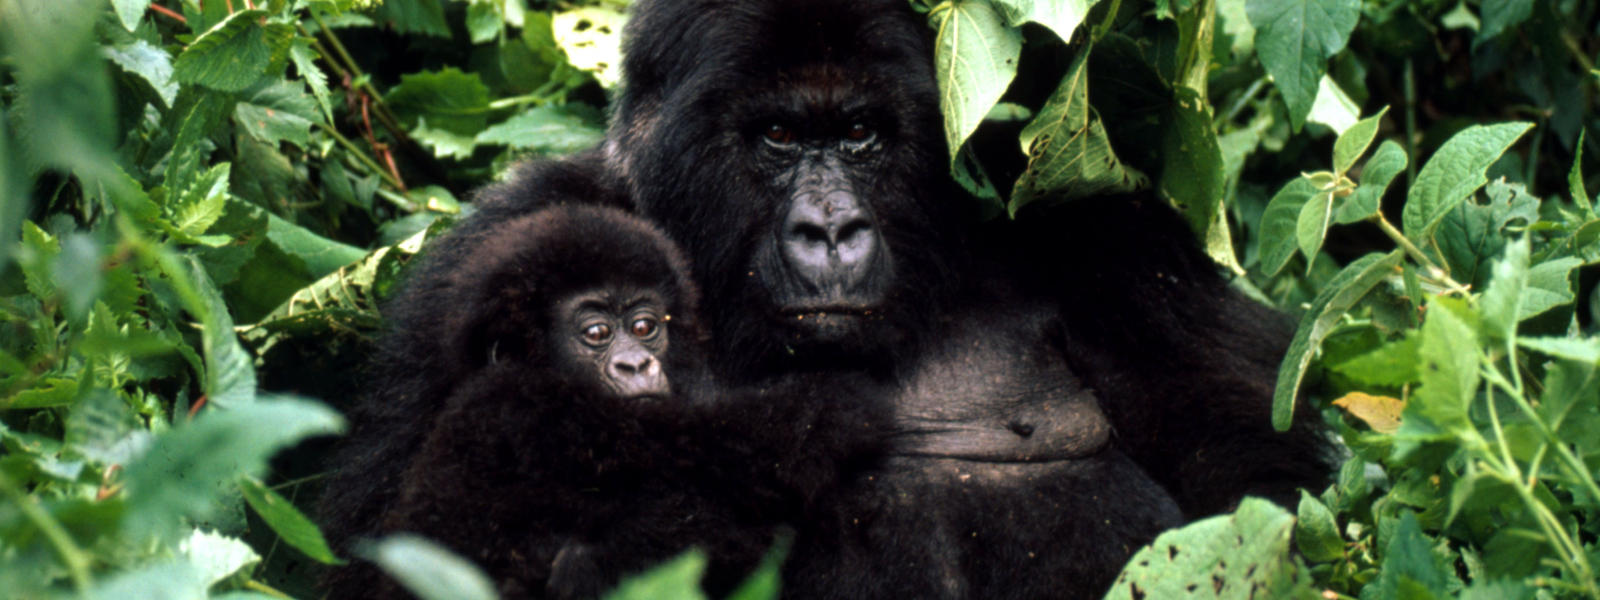 African mountain animals - Gorillas New Hero Image